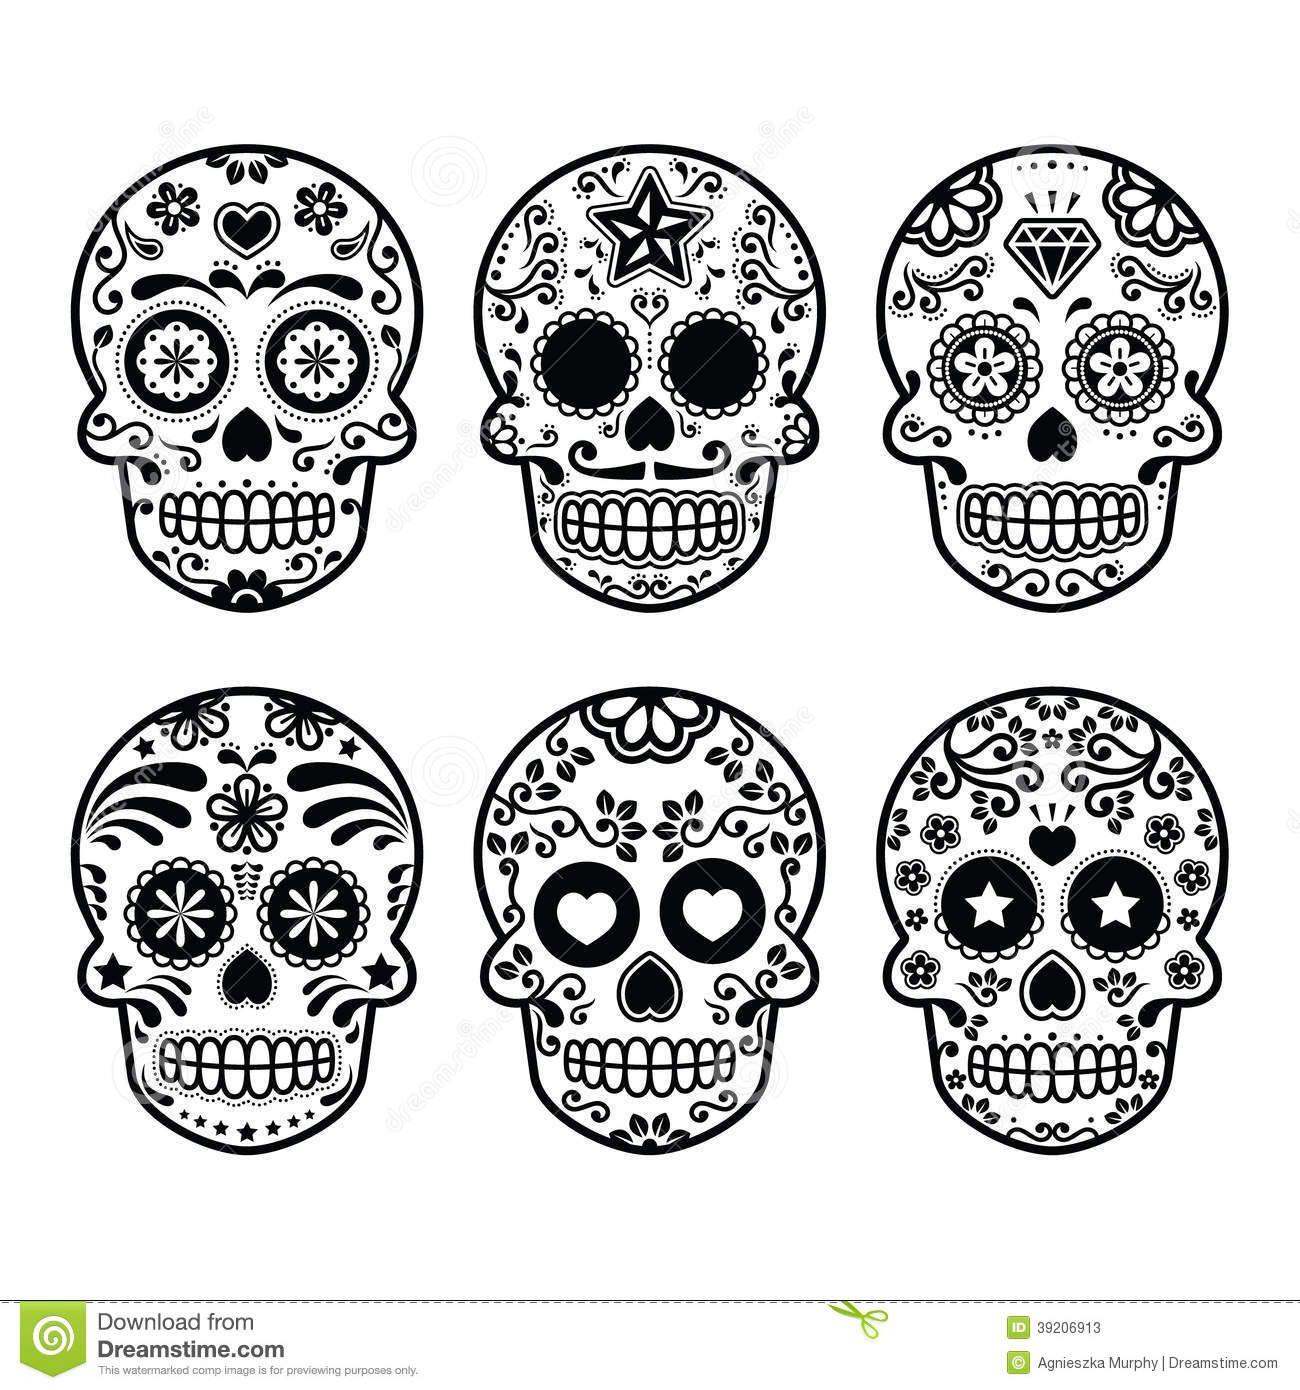 black and white library Dia de los muertos clipart simple. Mexican sugar skull icons